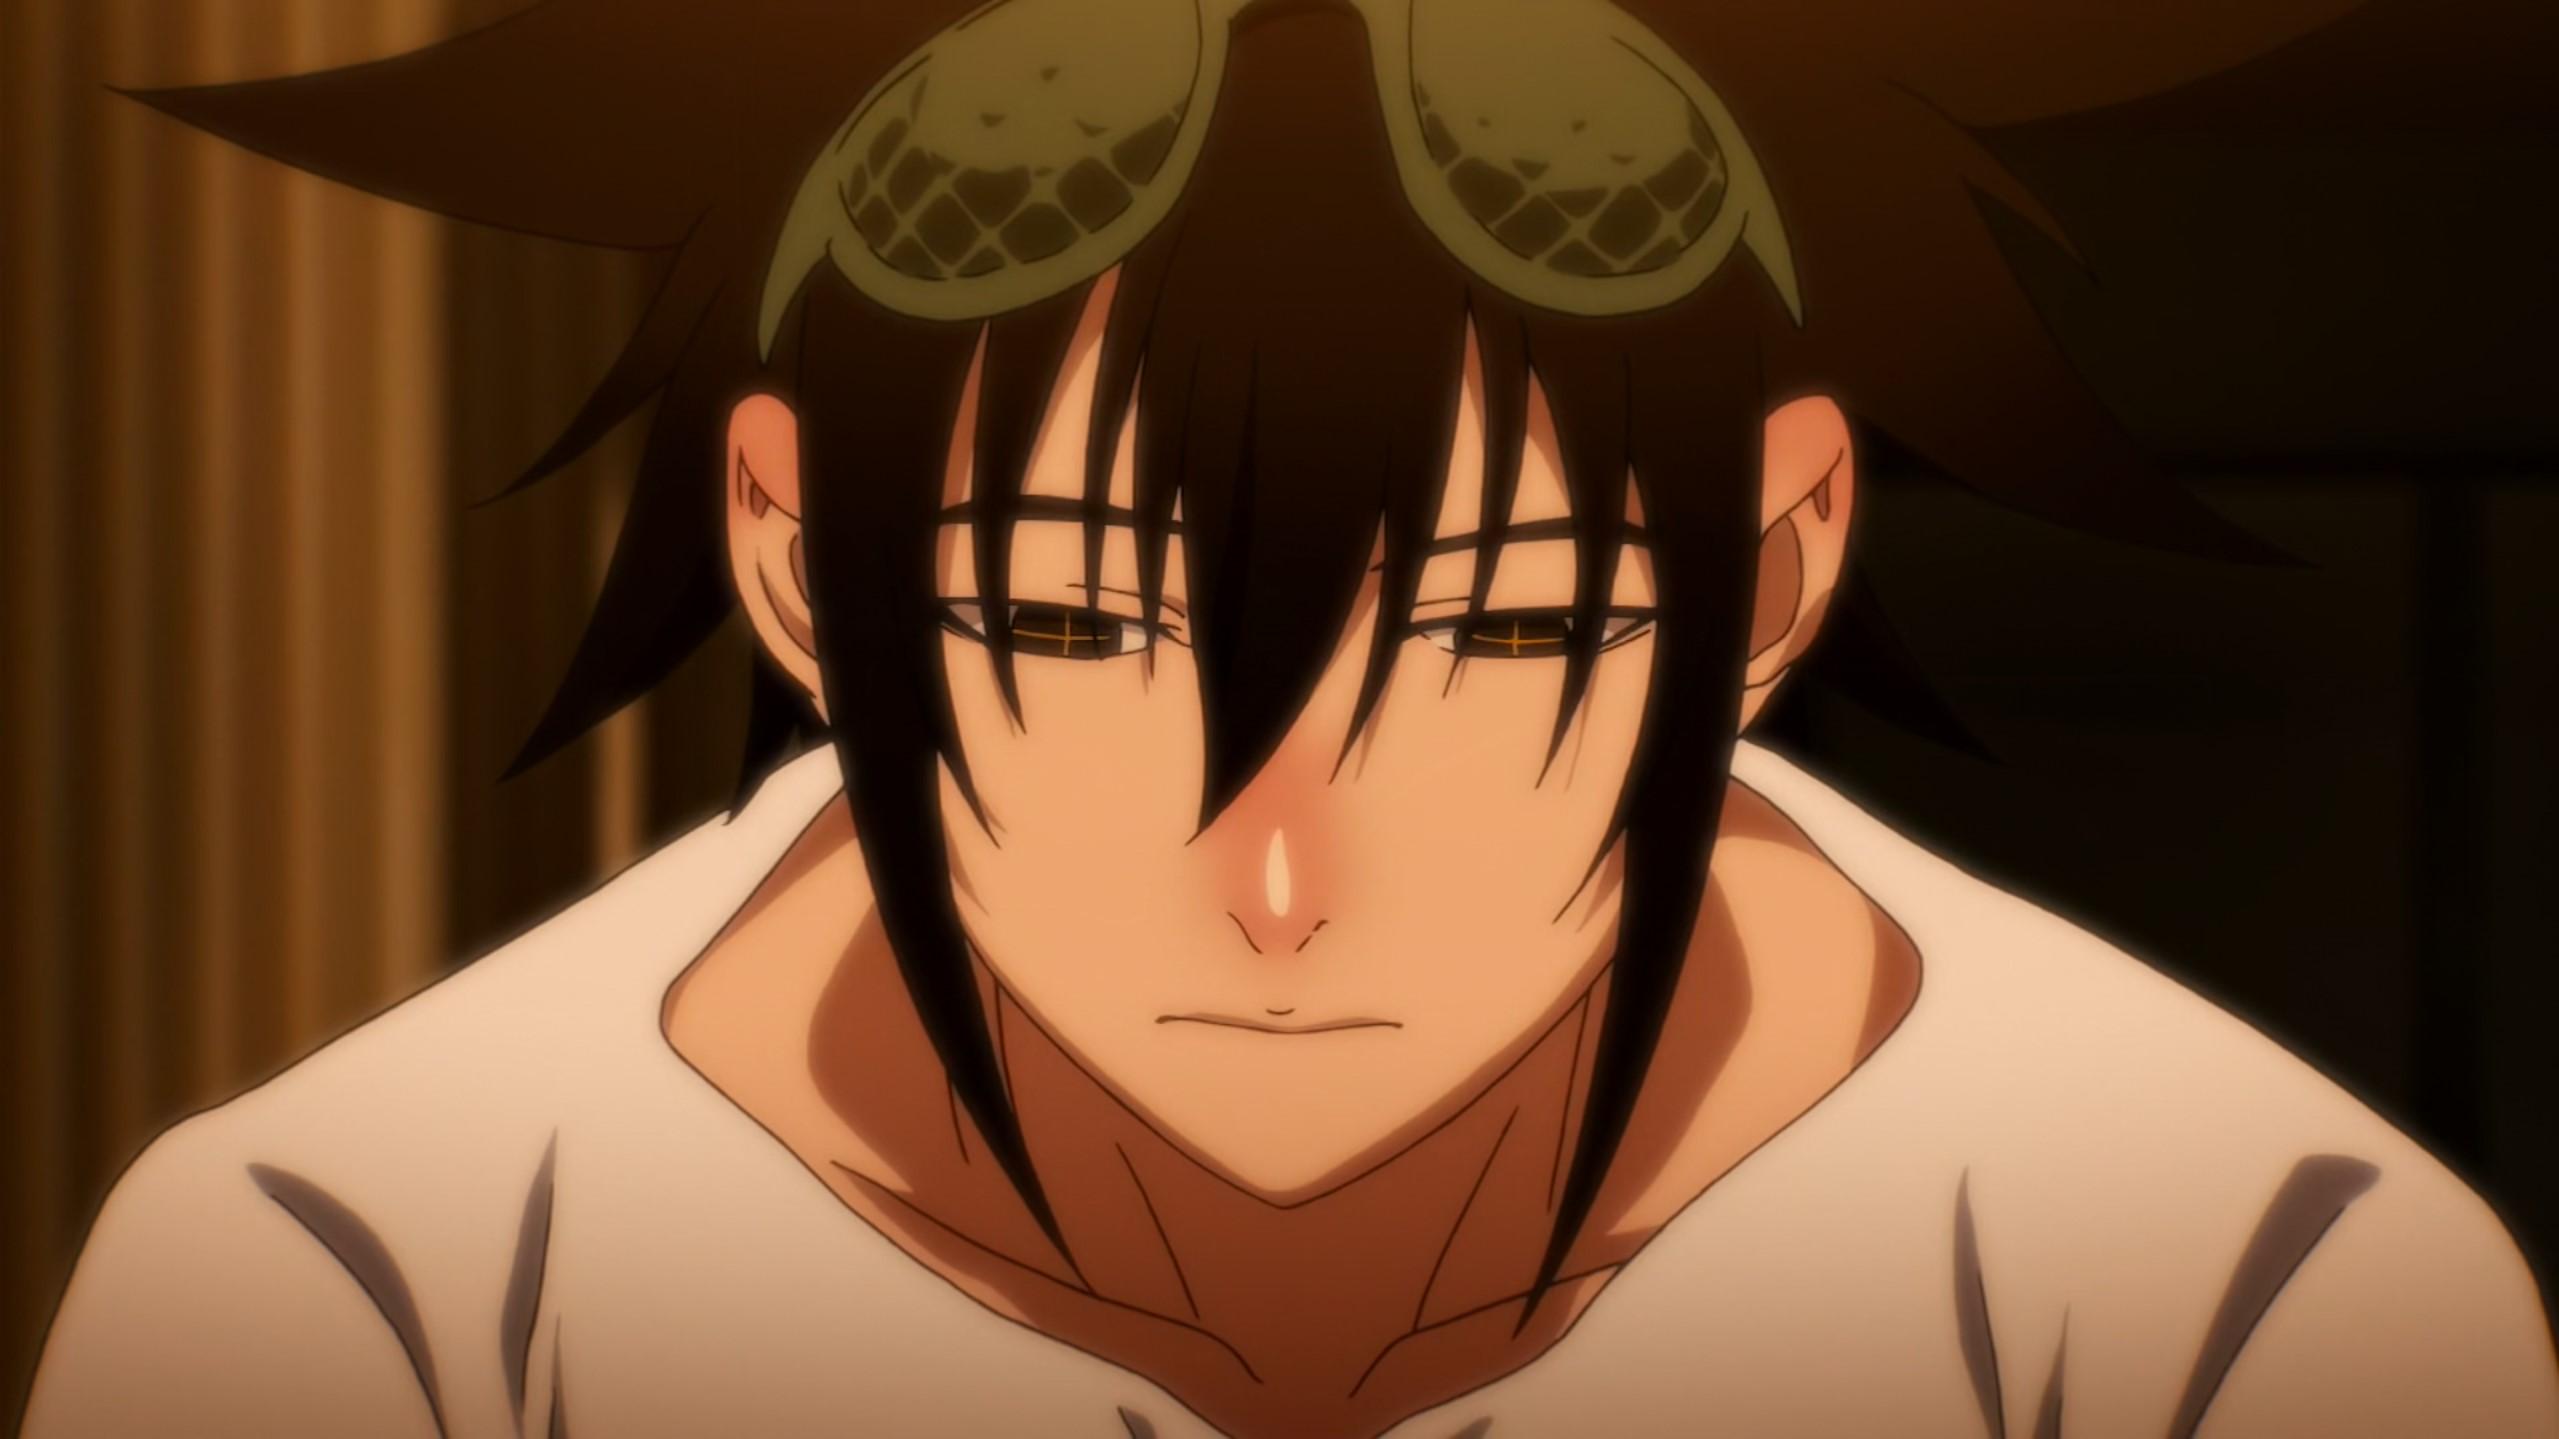 Mori triste the god of high school